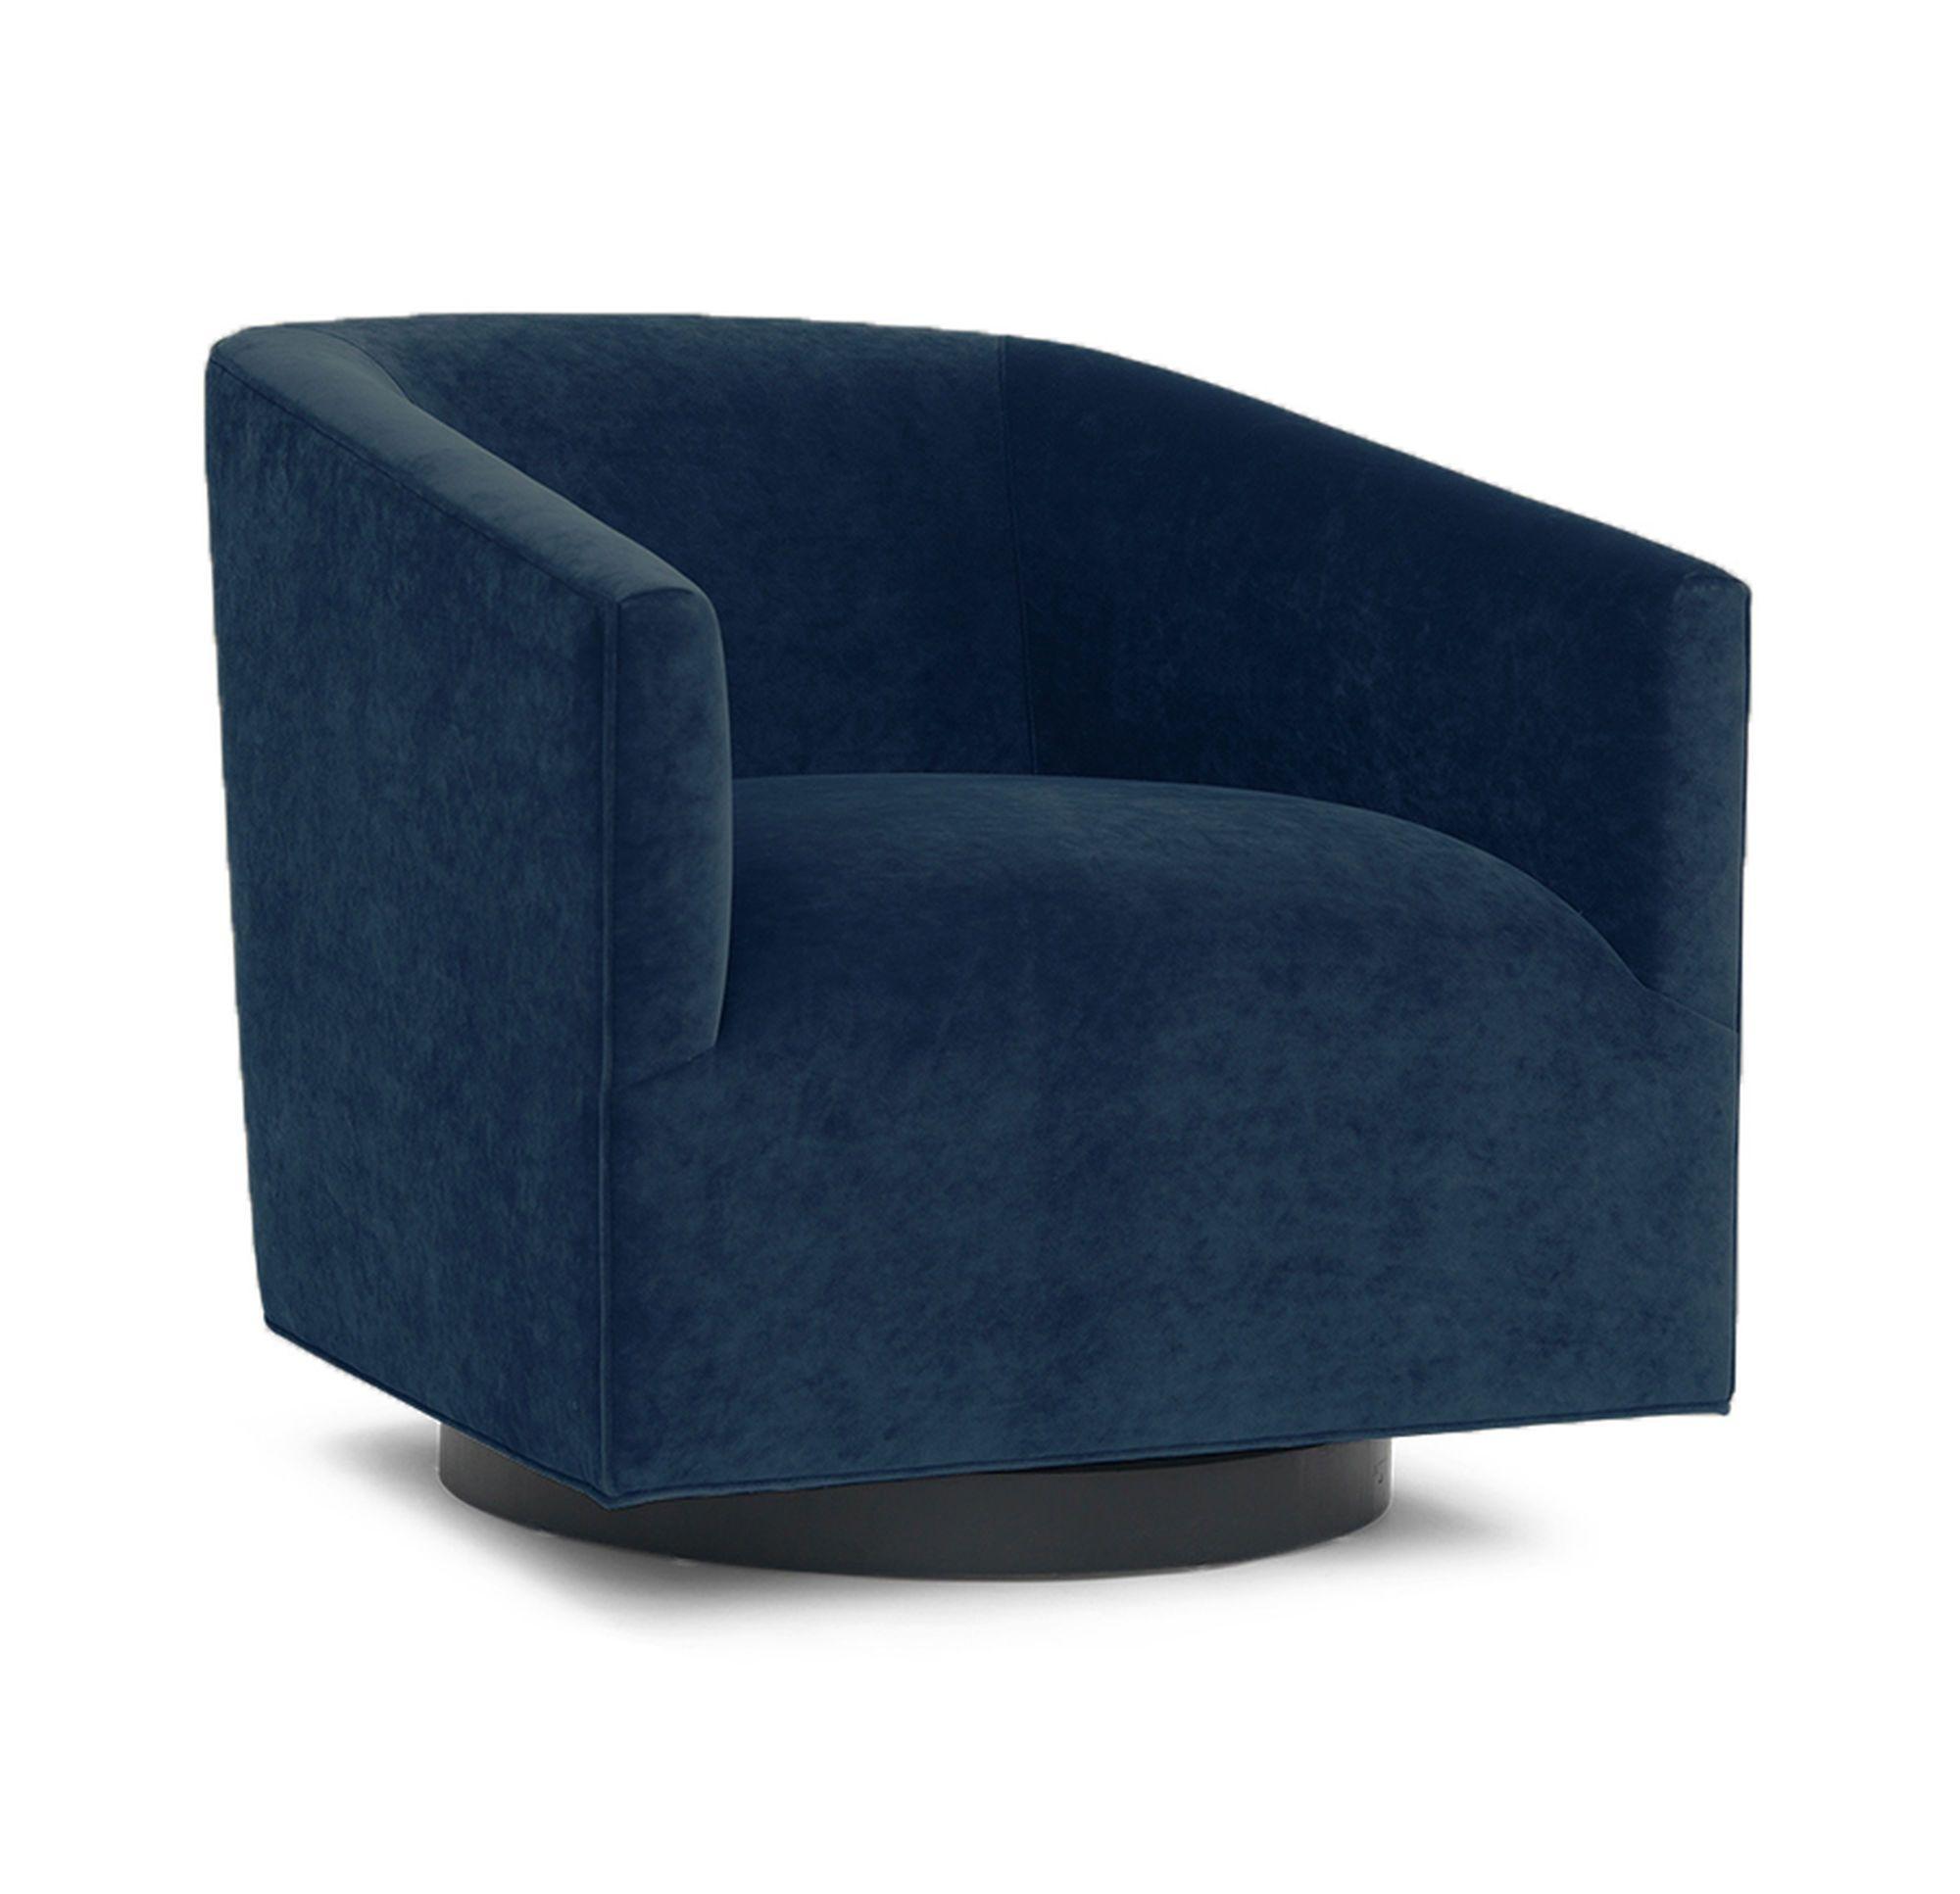 Peachy Cooper Full Swivel Chair Boulevard Deep Blu Hi Res Sk Creativecarmelina Interior Chair Design Creativecarmelinacom